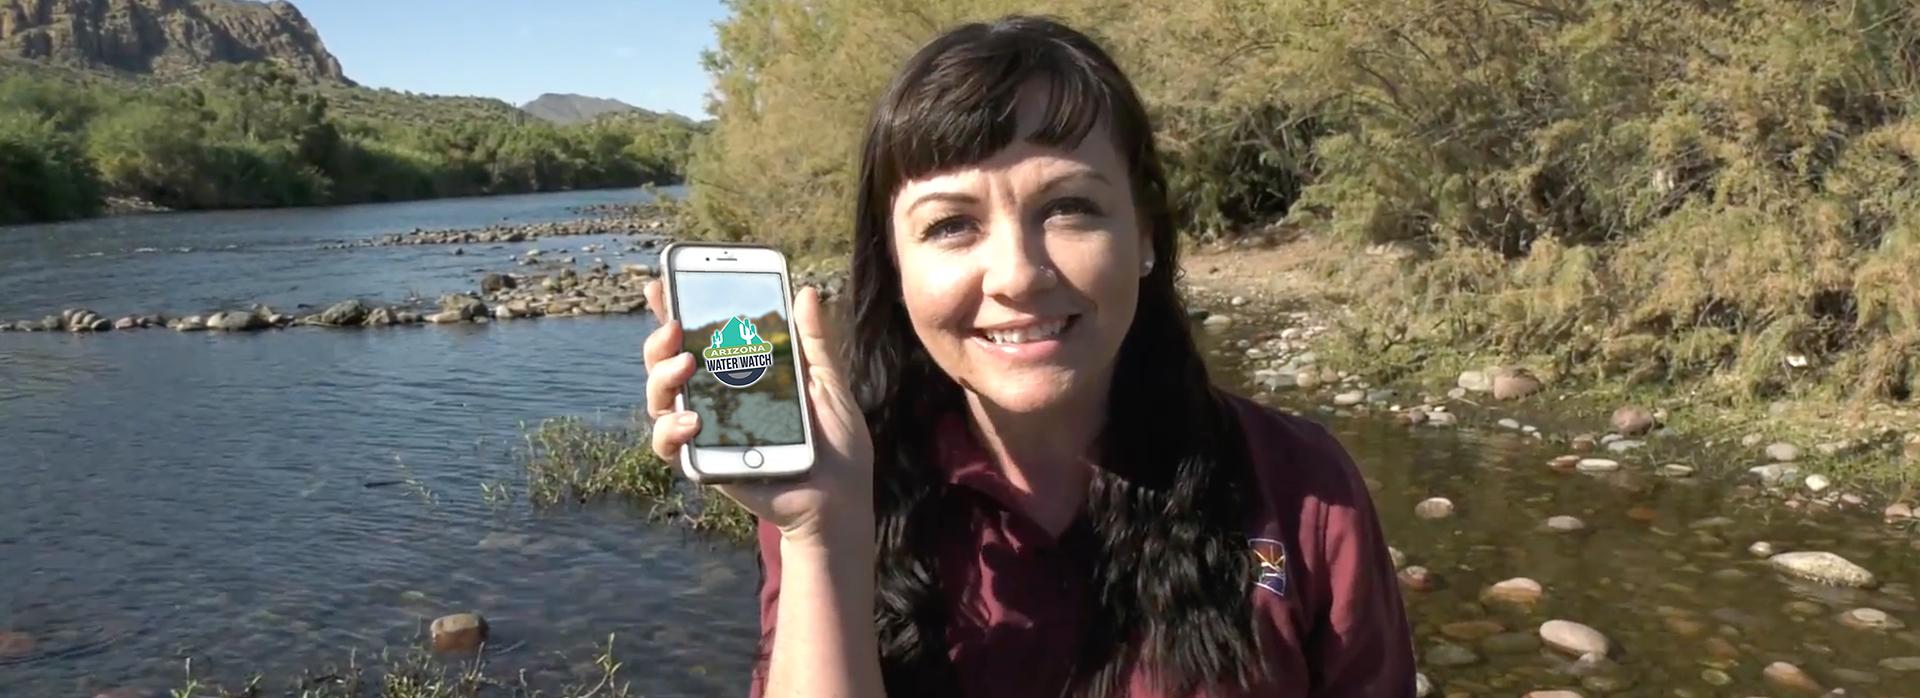 ADEQ Water Watch App